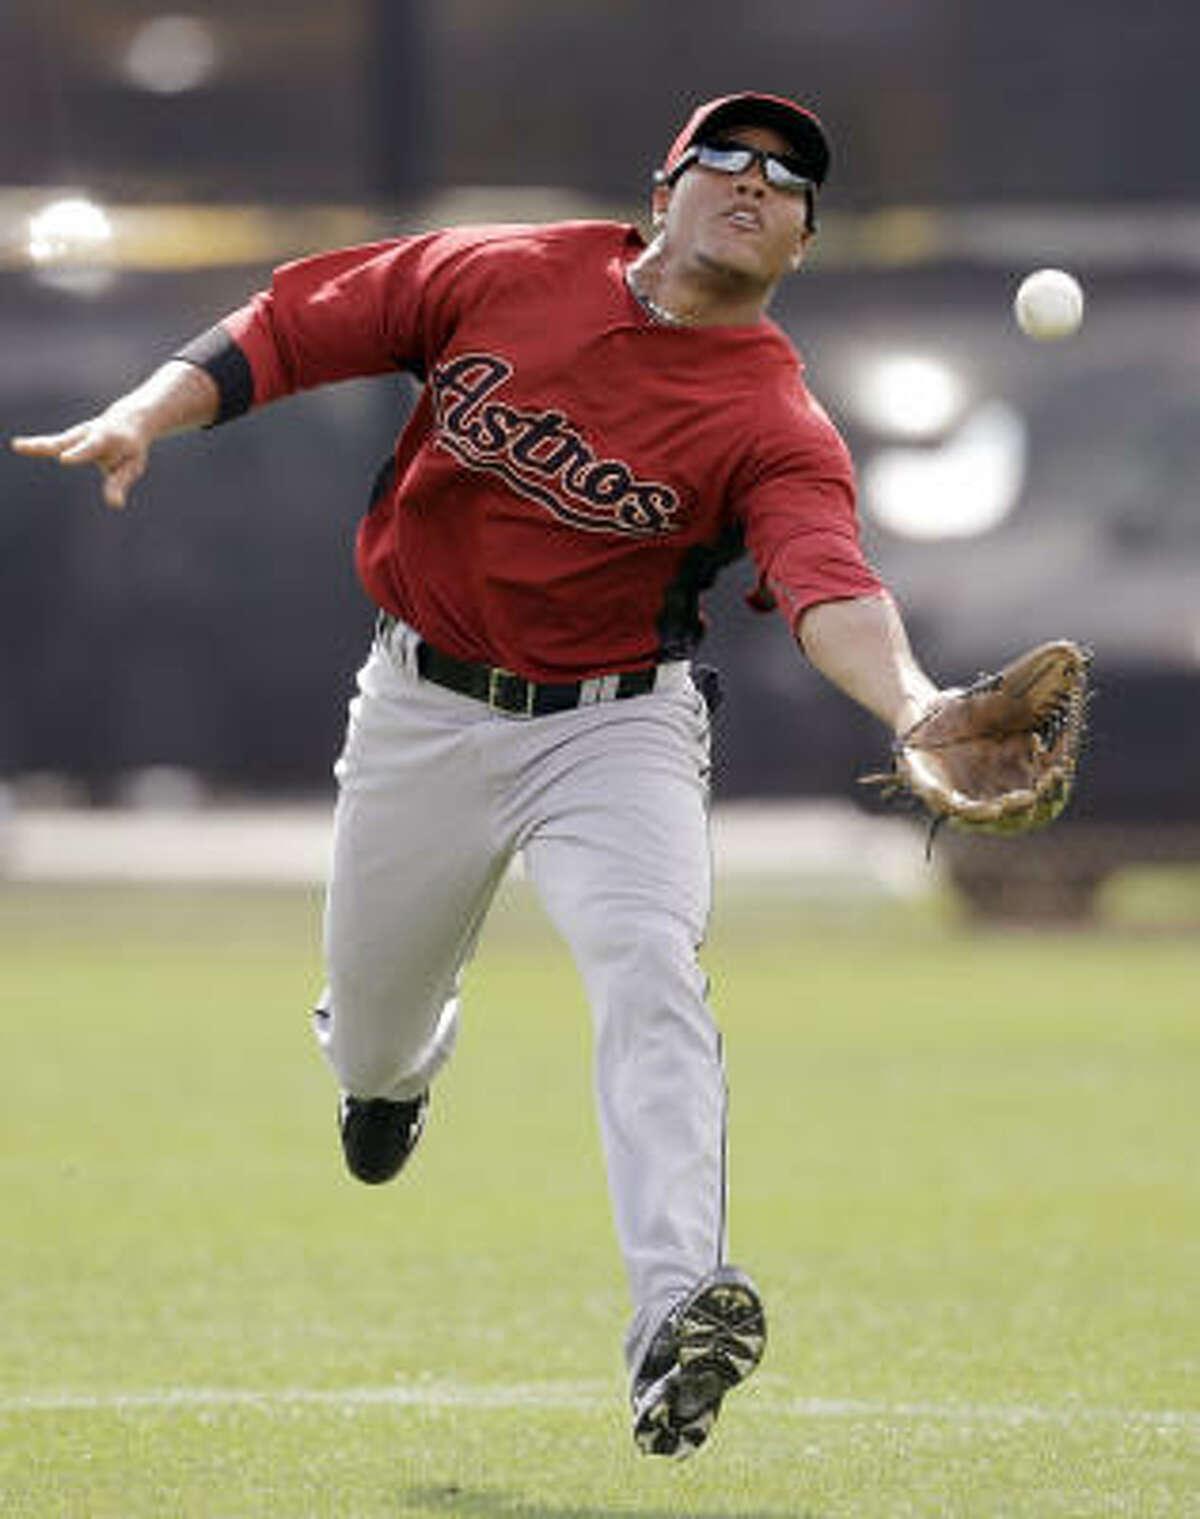 Yordany Ramirez Age: 25 Bats: Right Status: 40-man roster MLB experience: None 2009 season: Class AAA Round Rock.